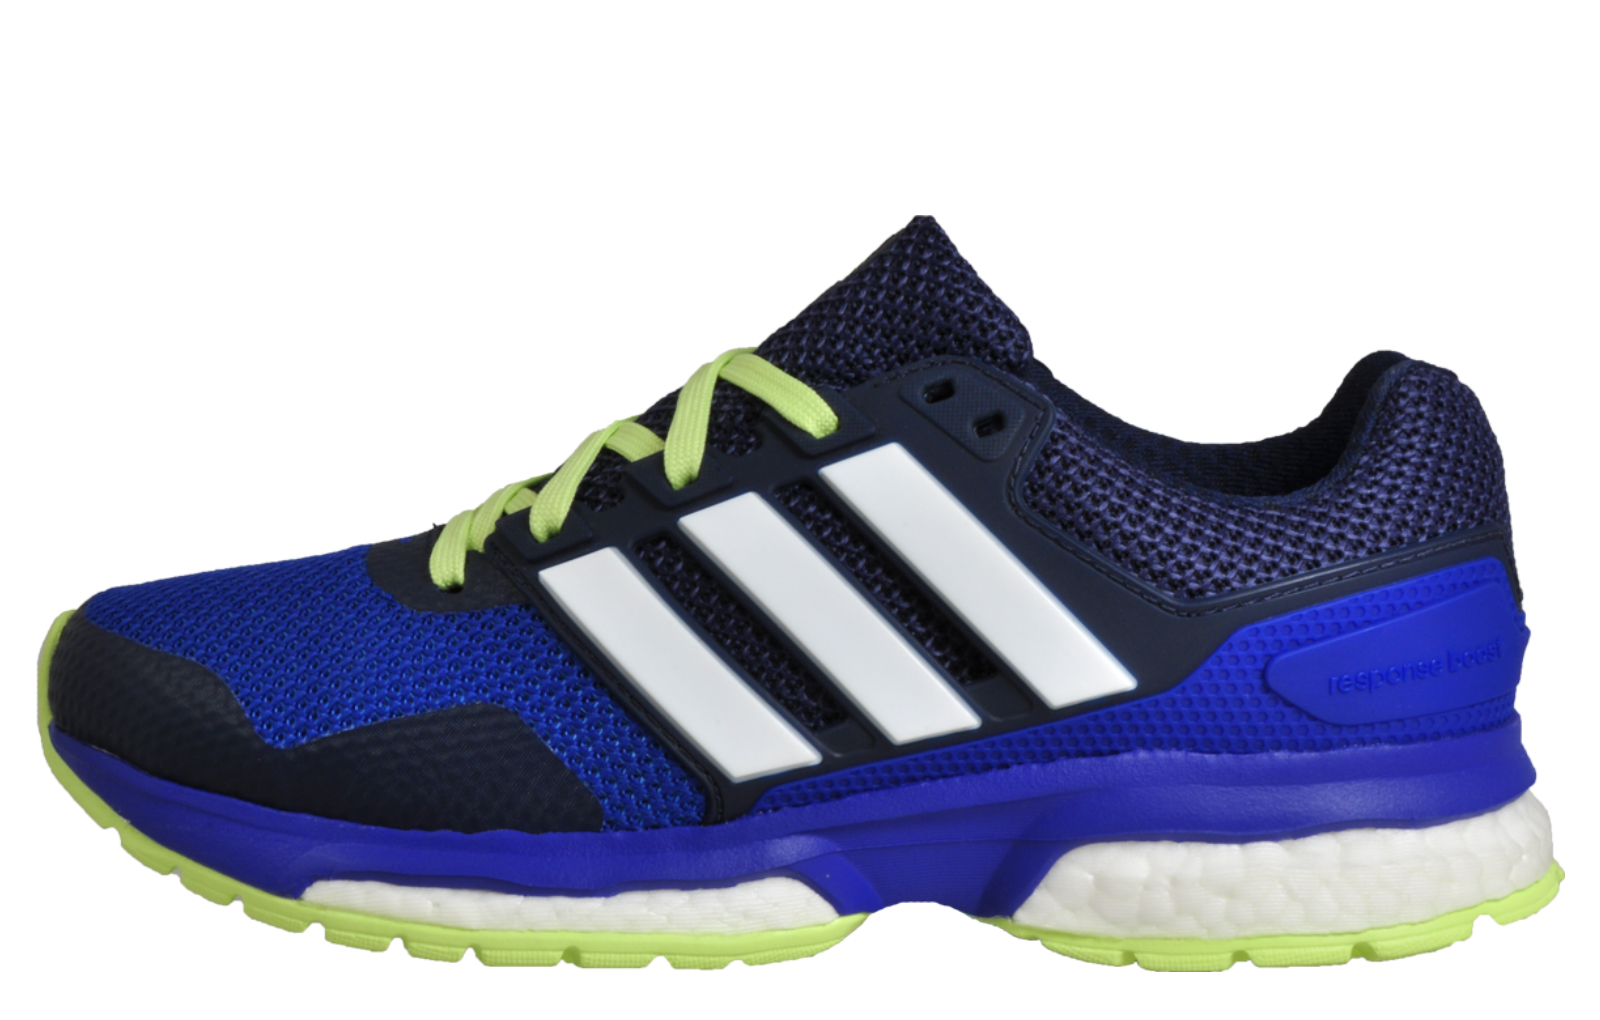 77cb5ed189c Adidas Response Boost 2 Womens - AD165522. alternate view 2